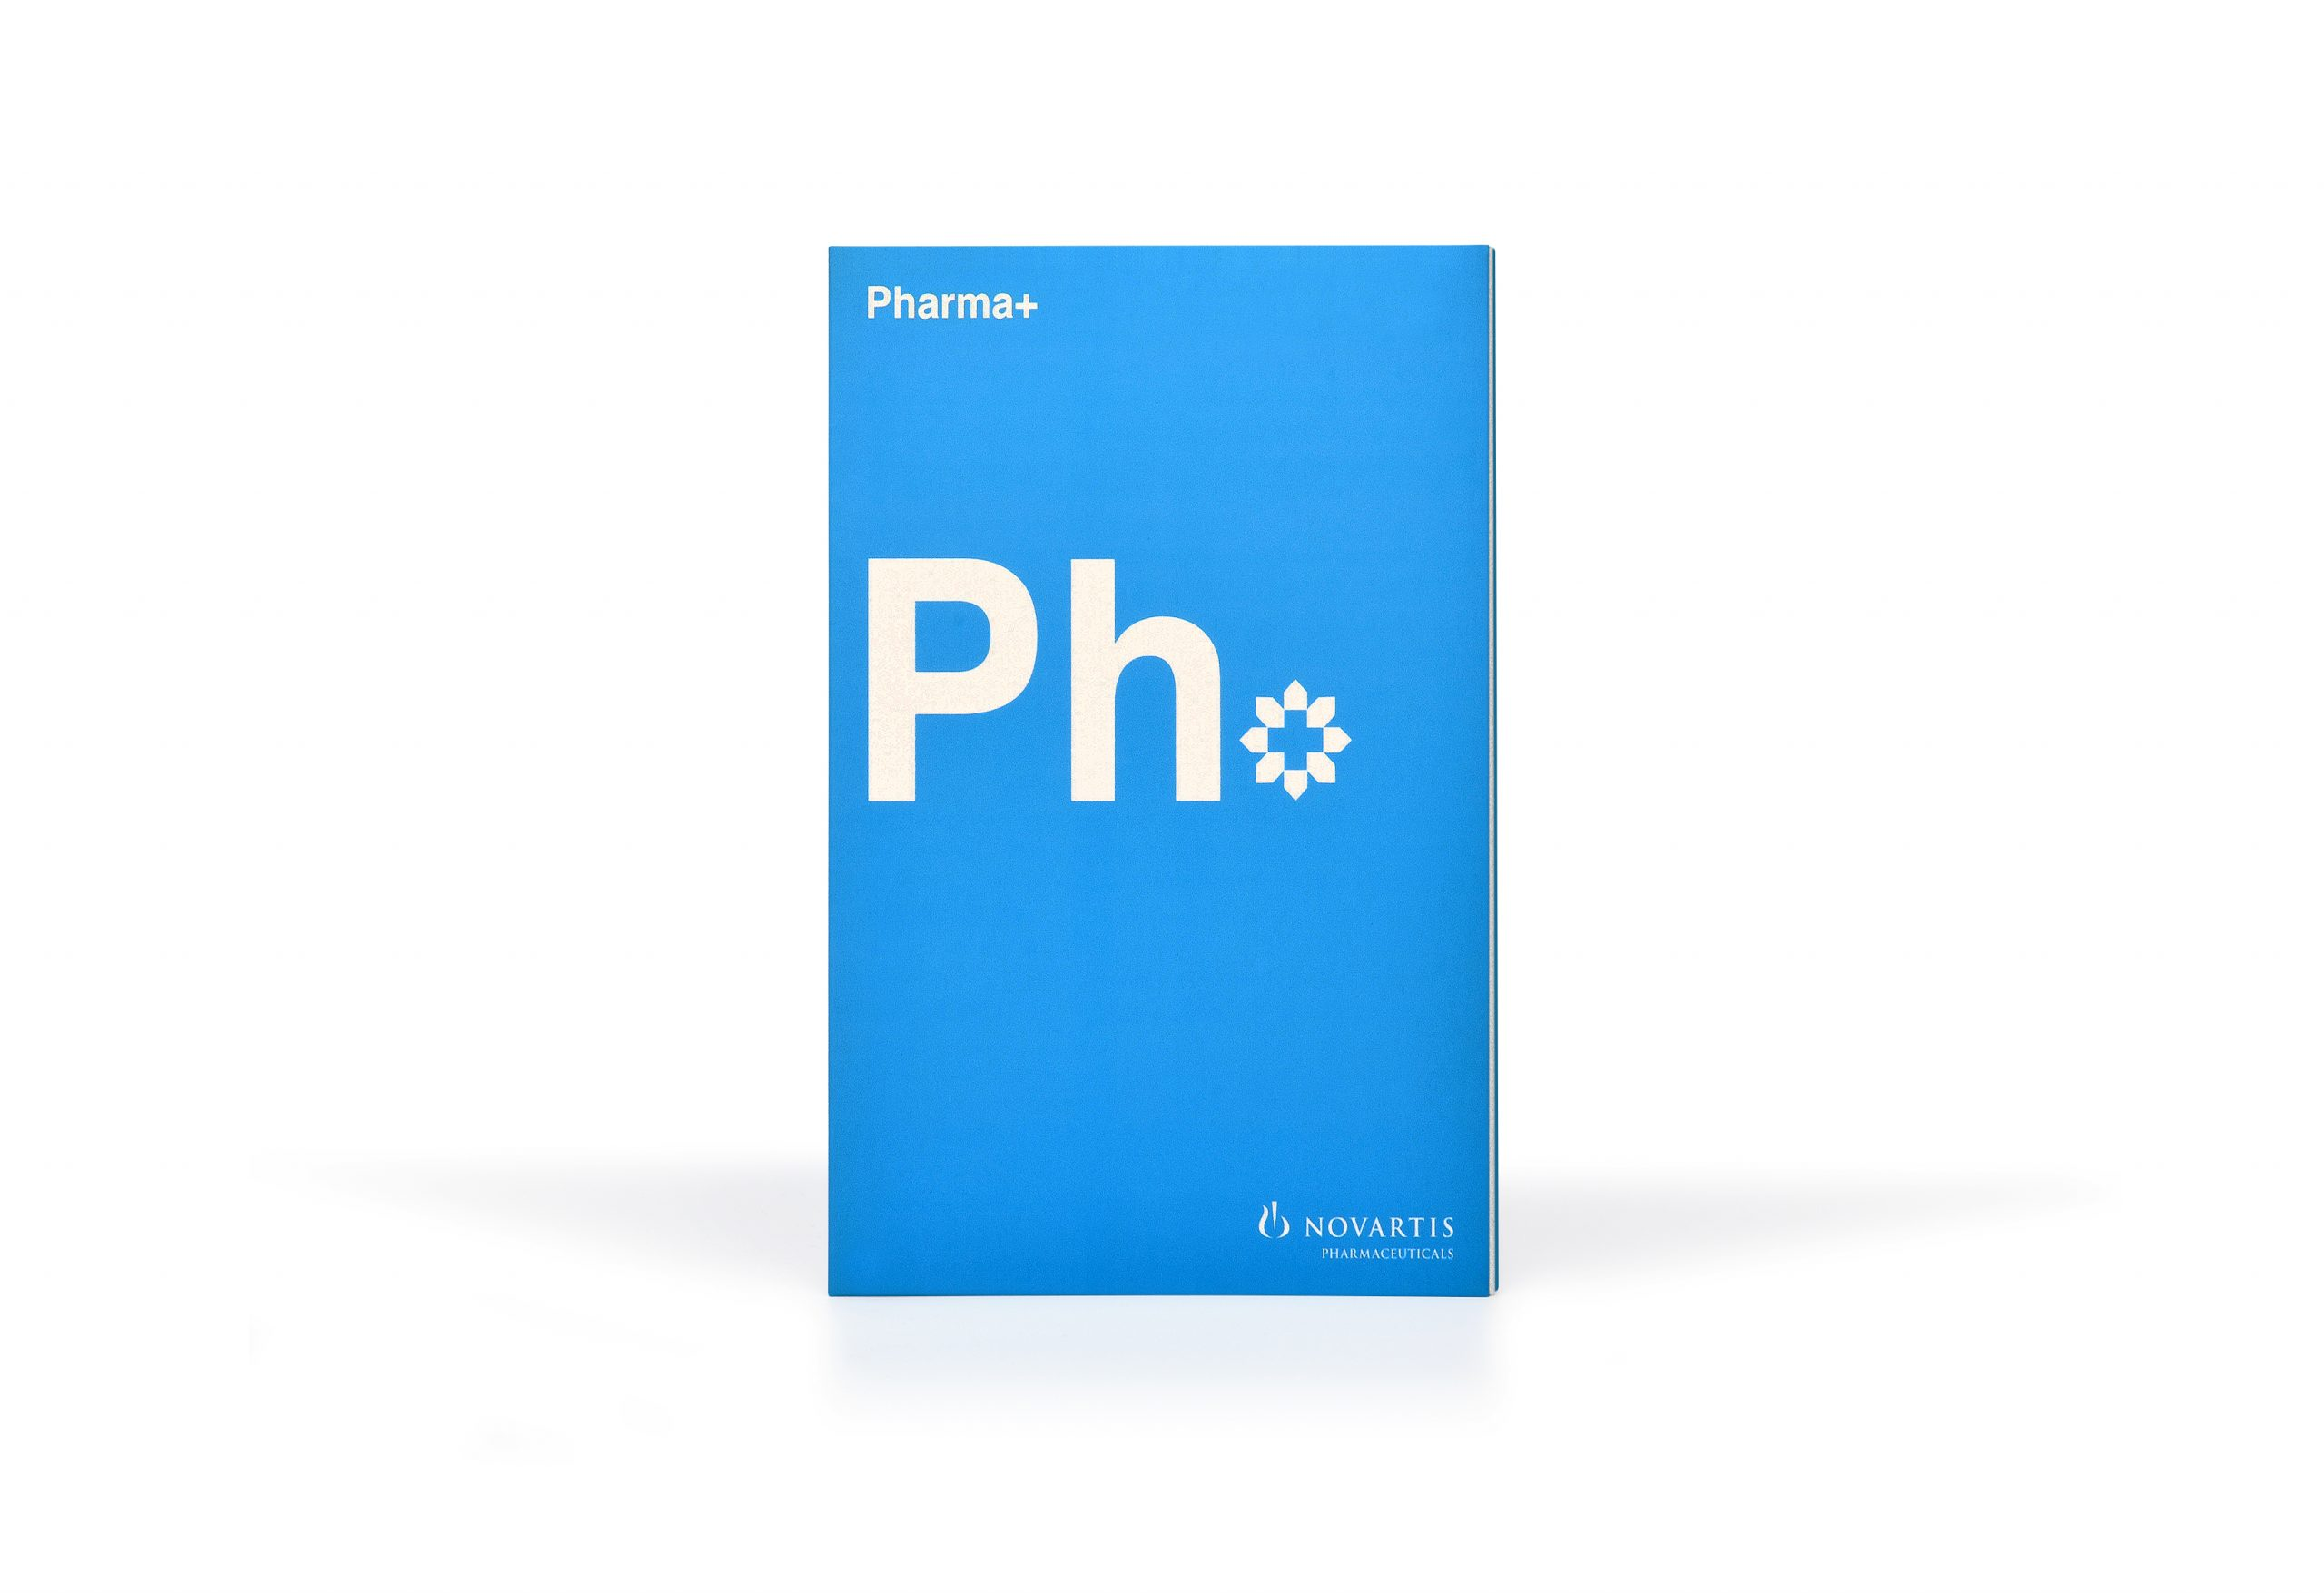 Pharma+_embalagem_cartolina